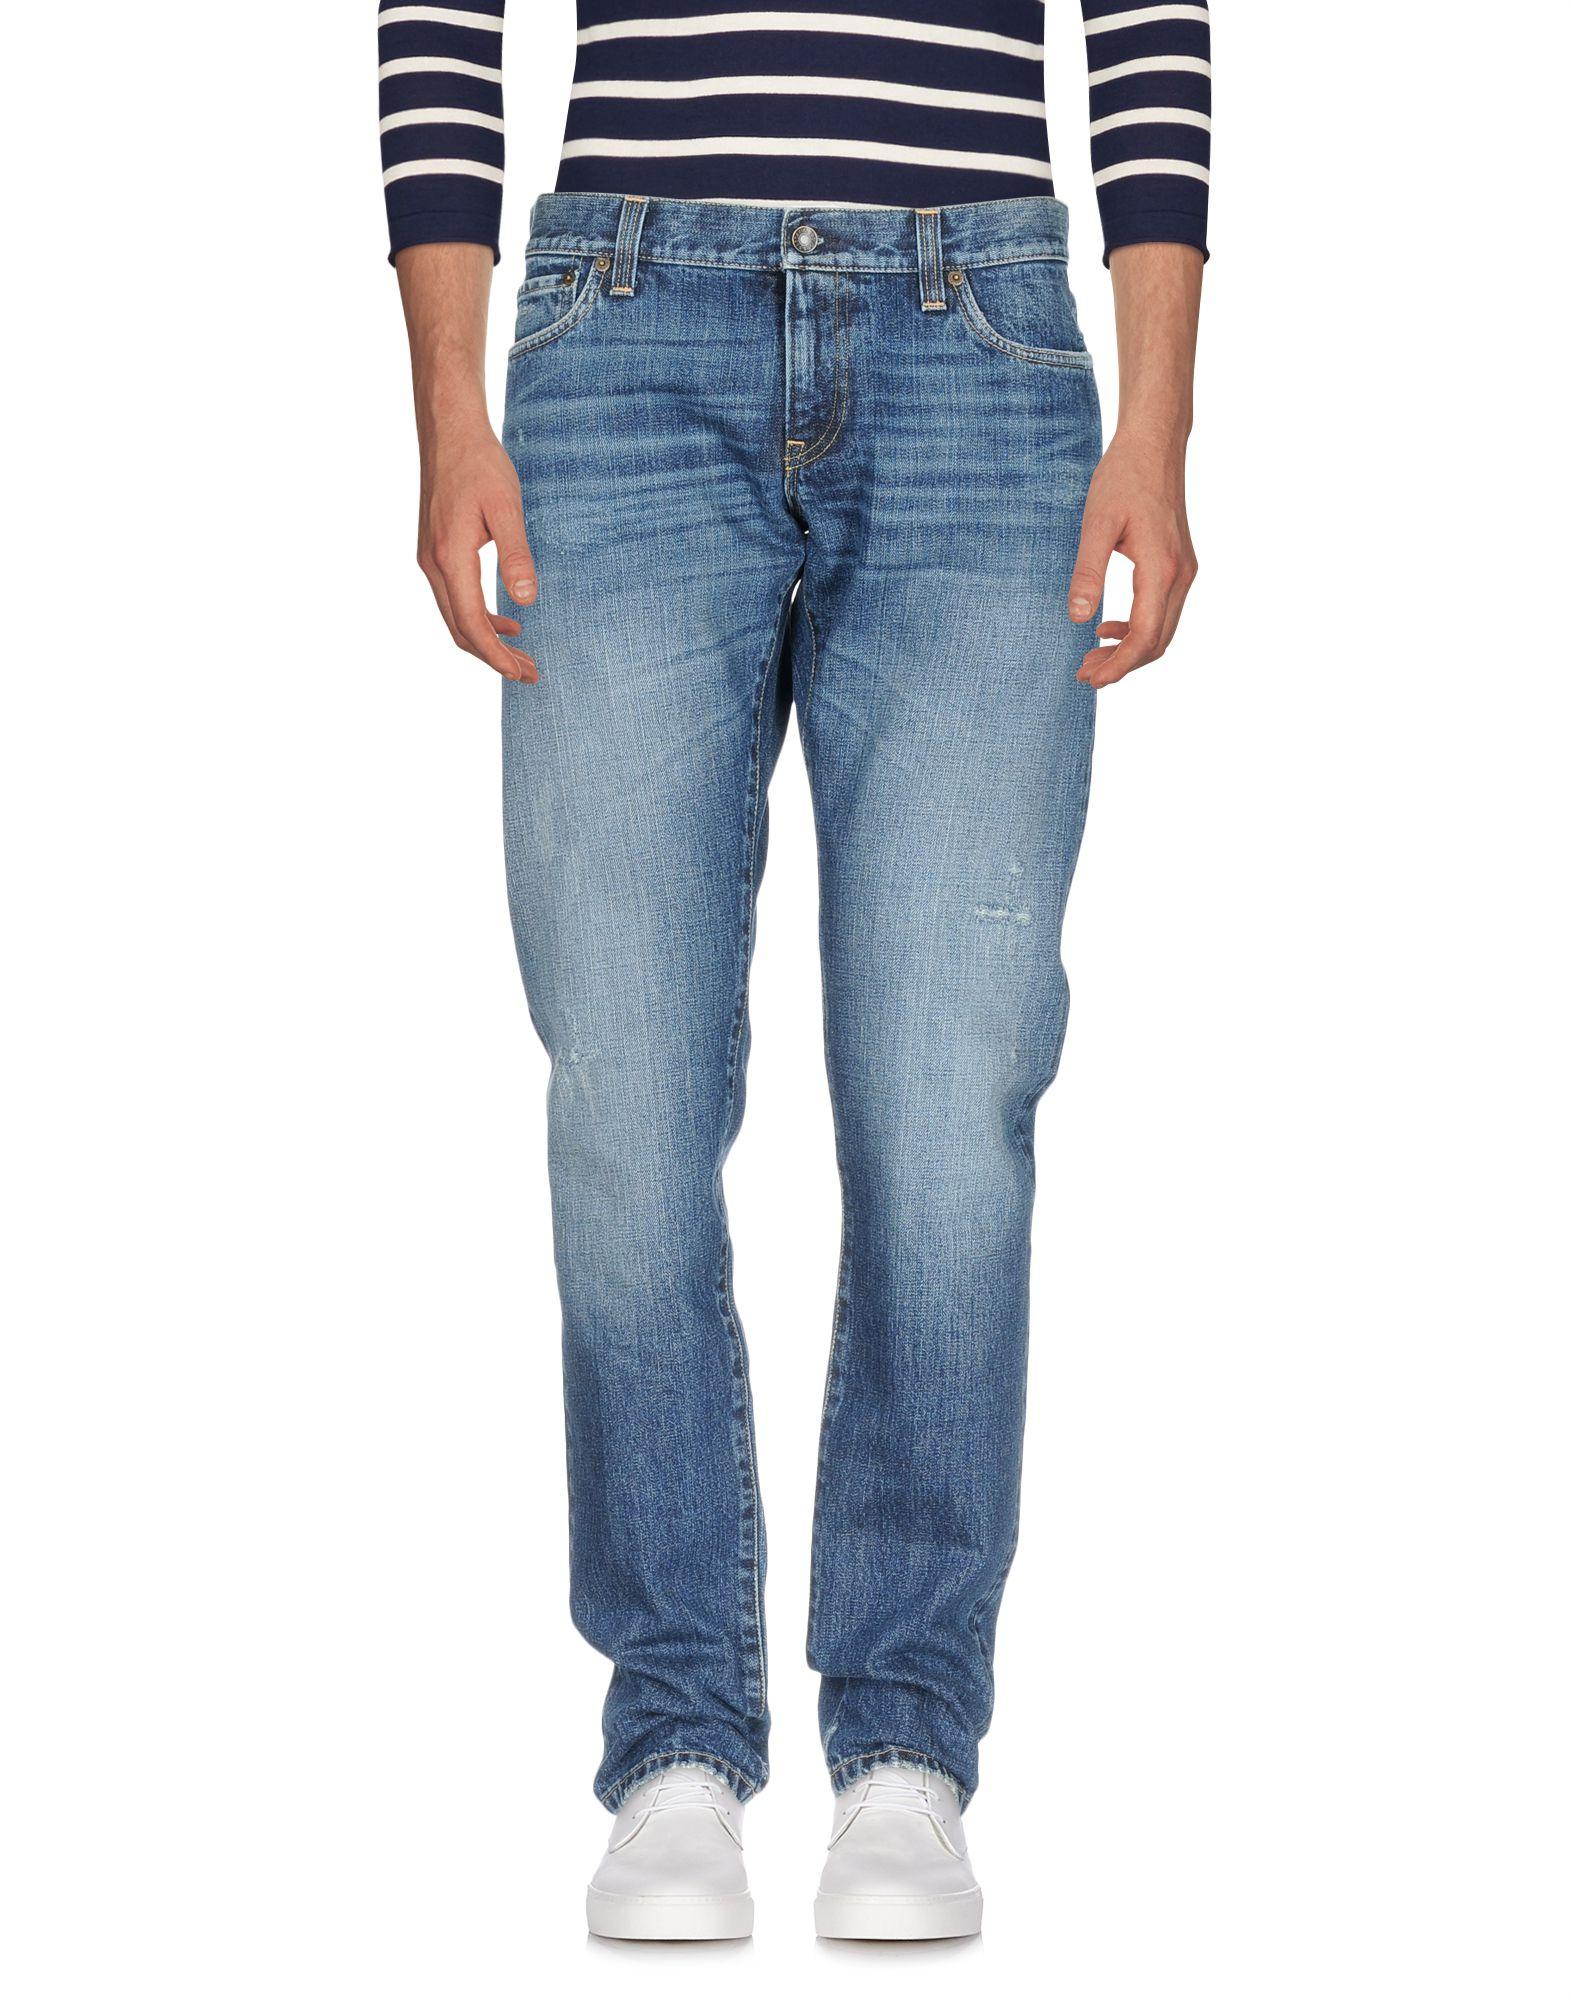 Pantaloni Jeans Dolce & Gabbana Uomo - Acquista online su